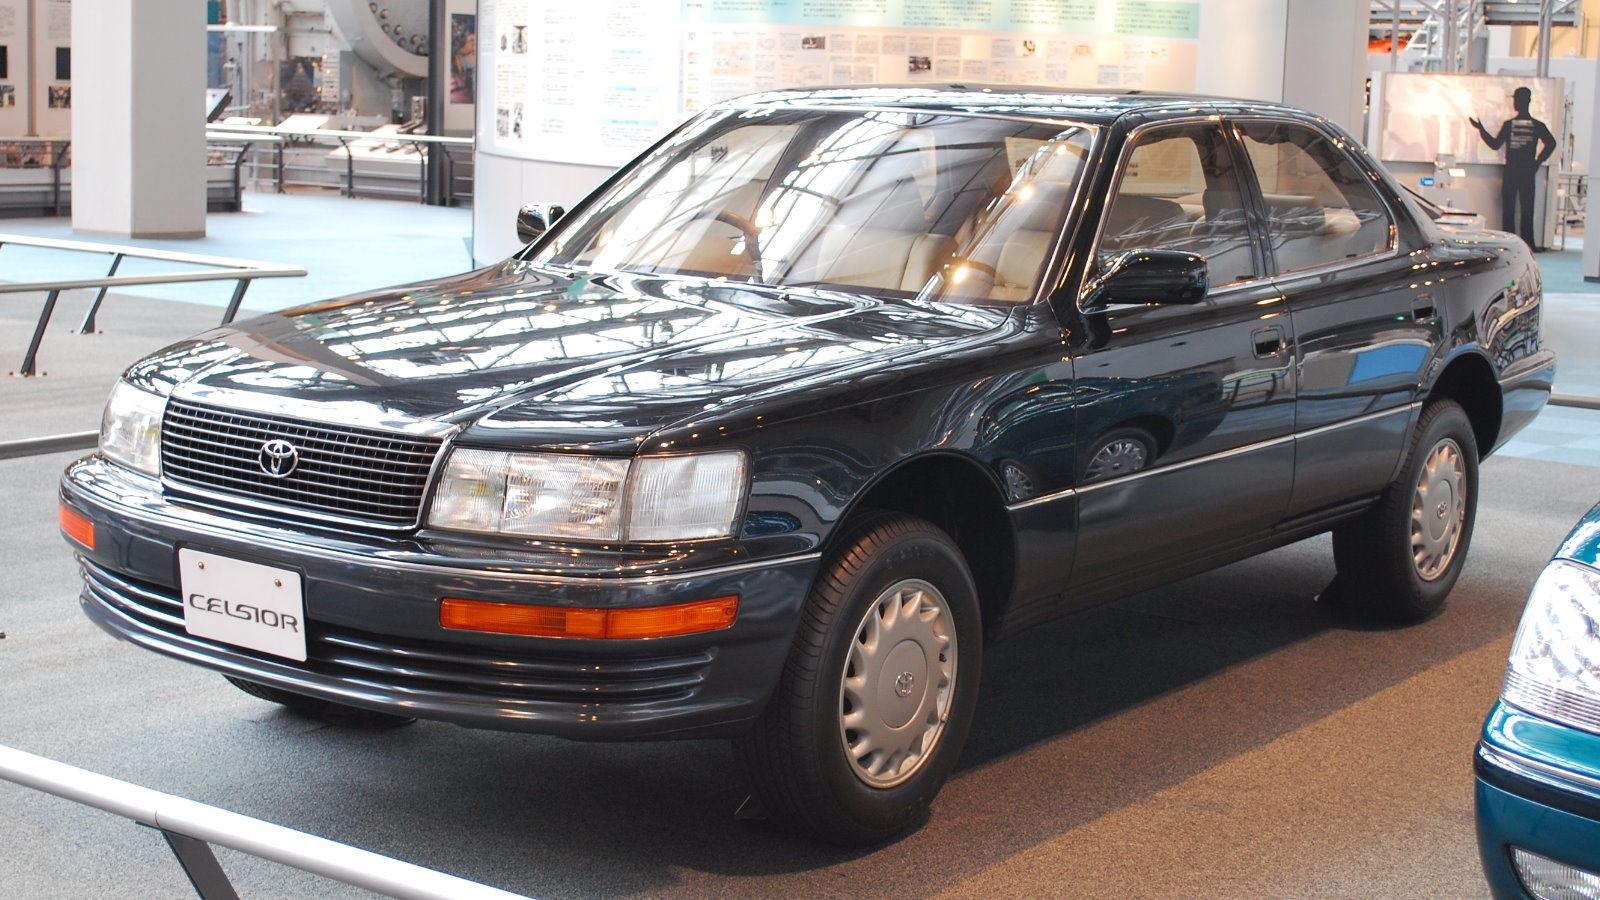 File:1989 Toyota Celsior 01.jpg - Wikimedia Commons